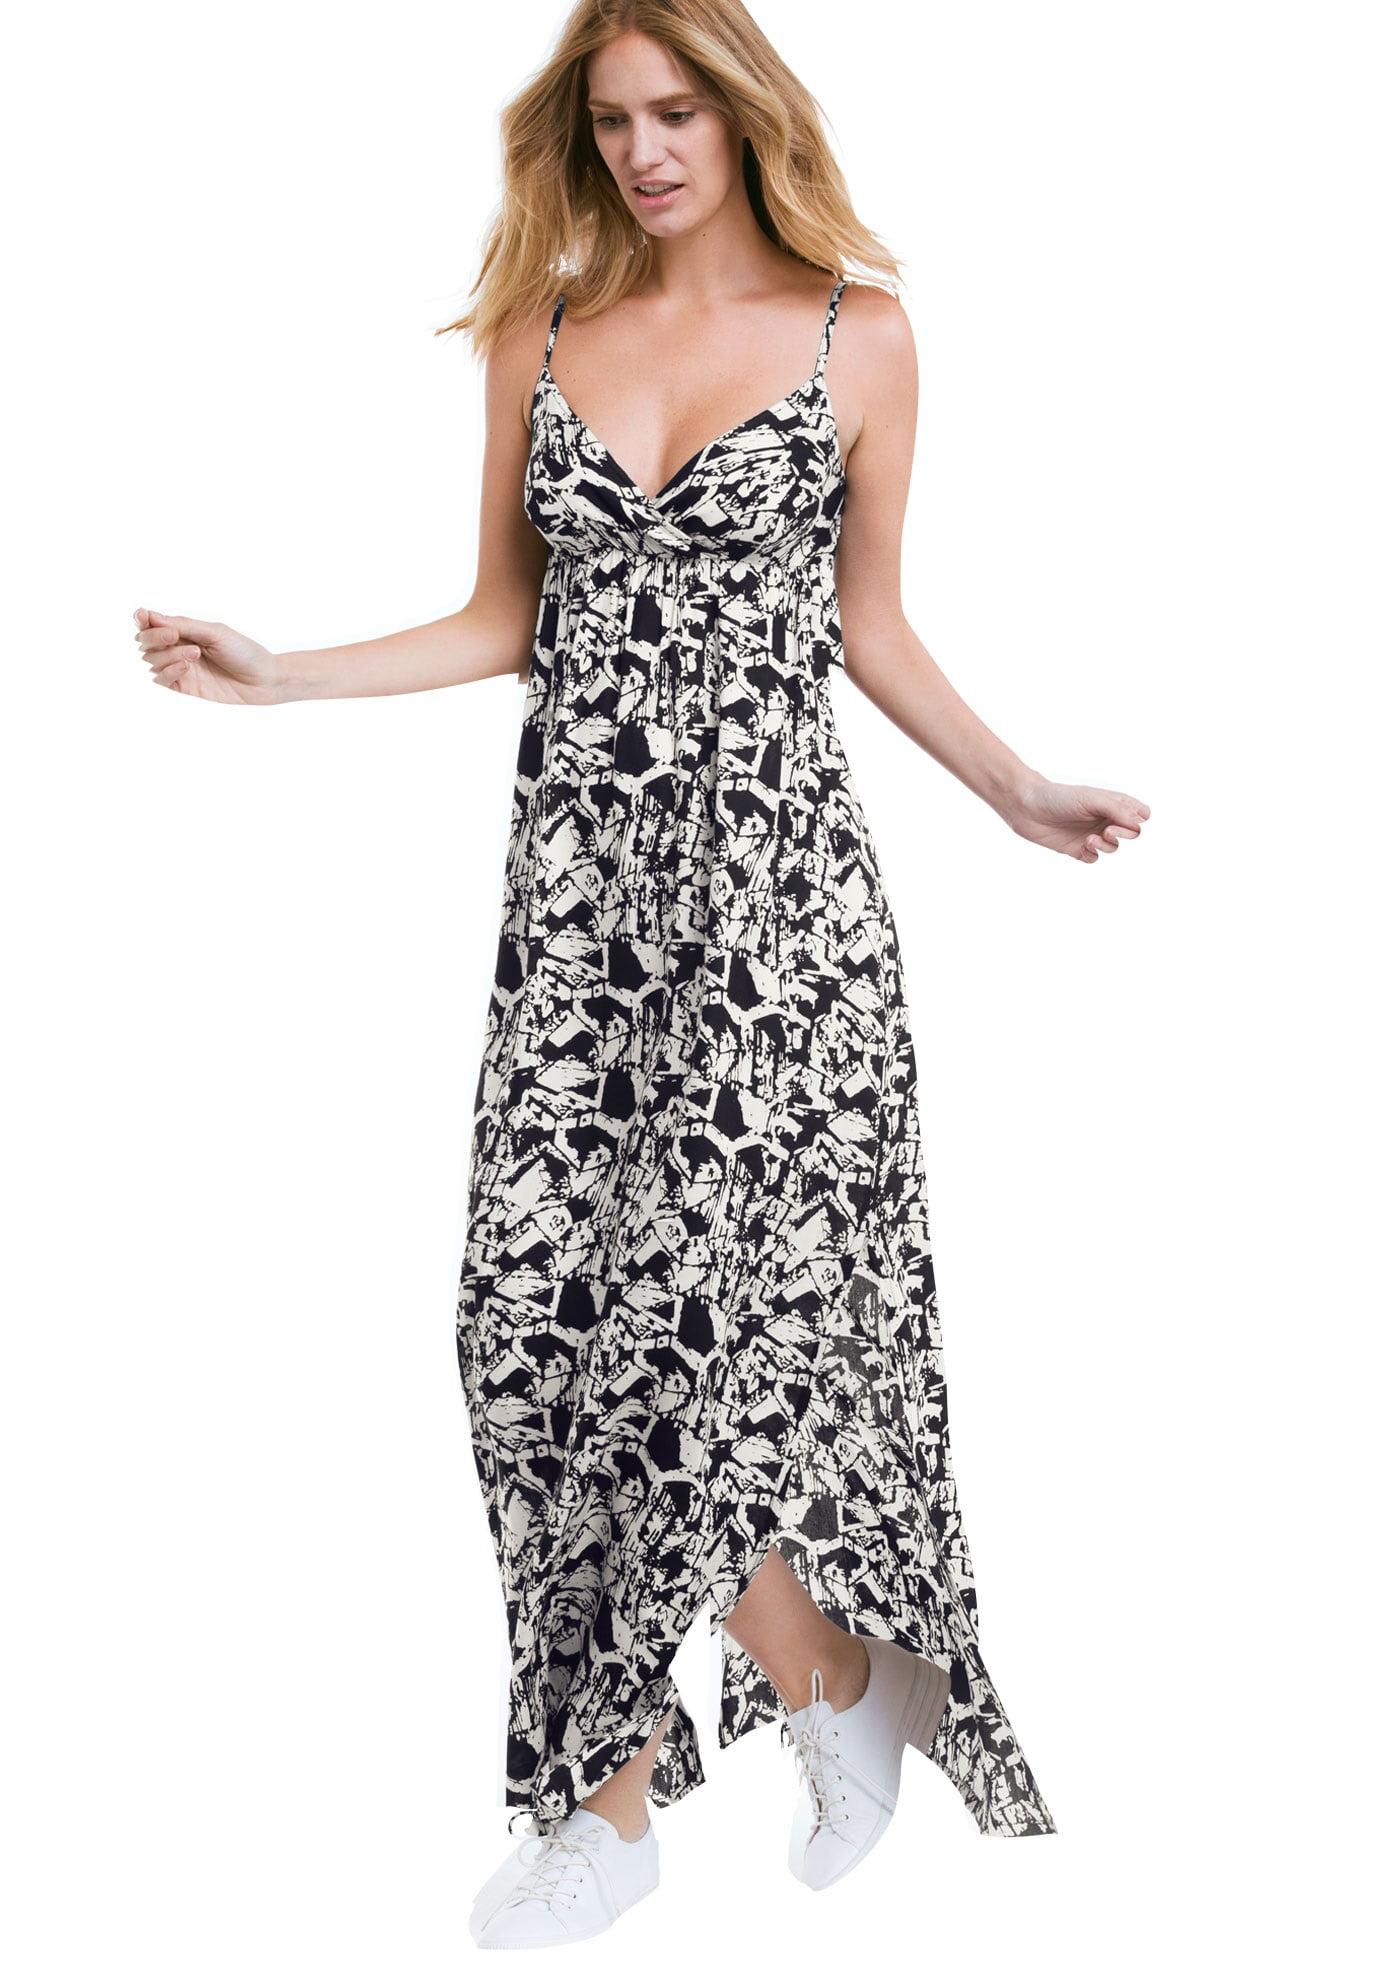 Plus Size Maxi Dresses Walmart | Saddha